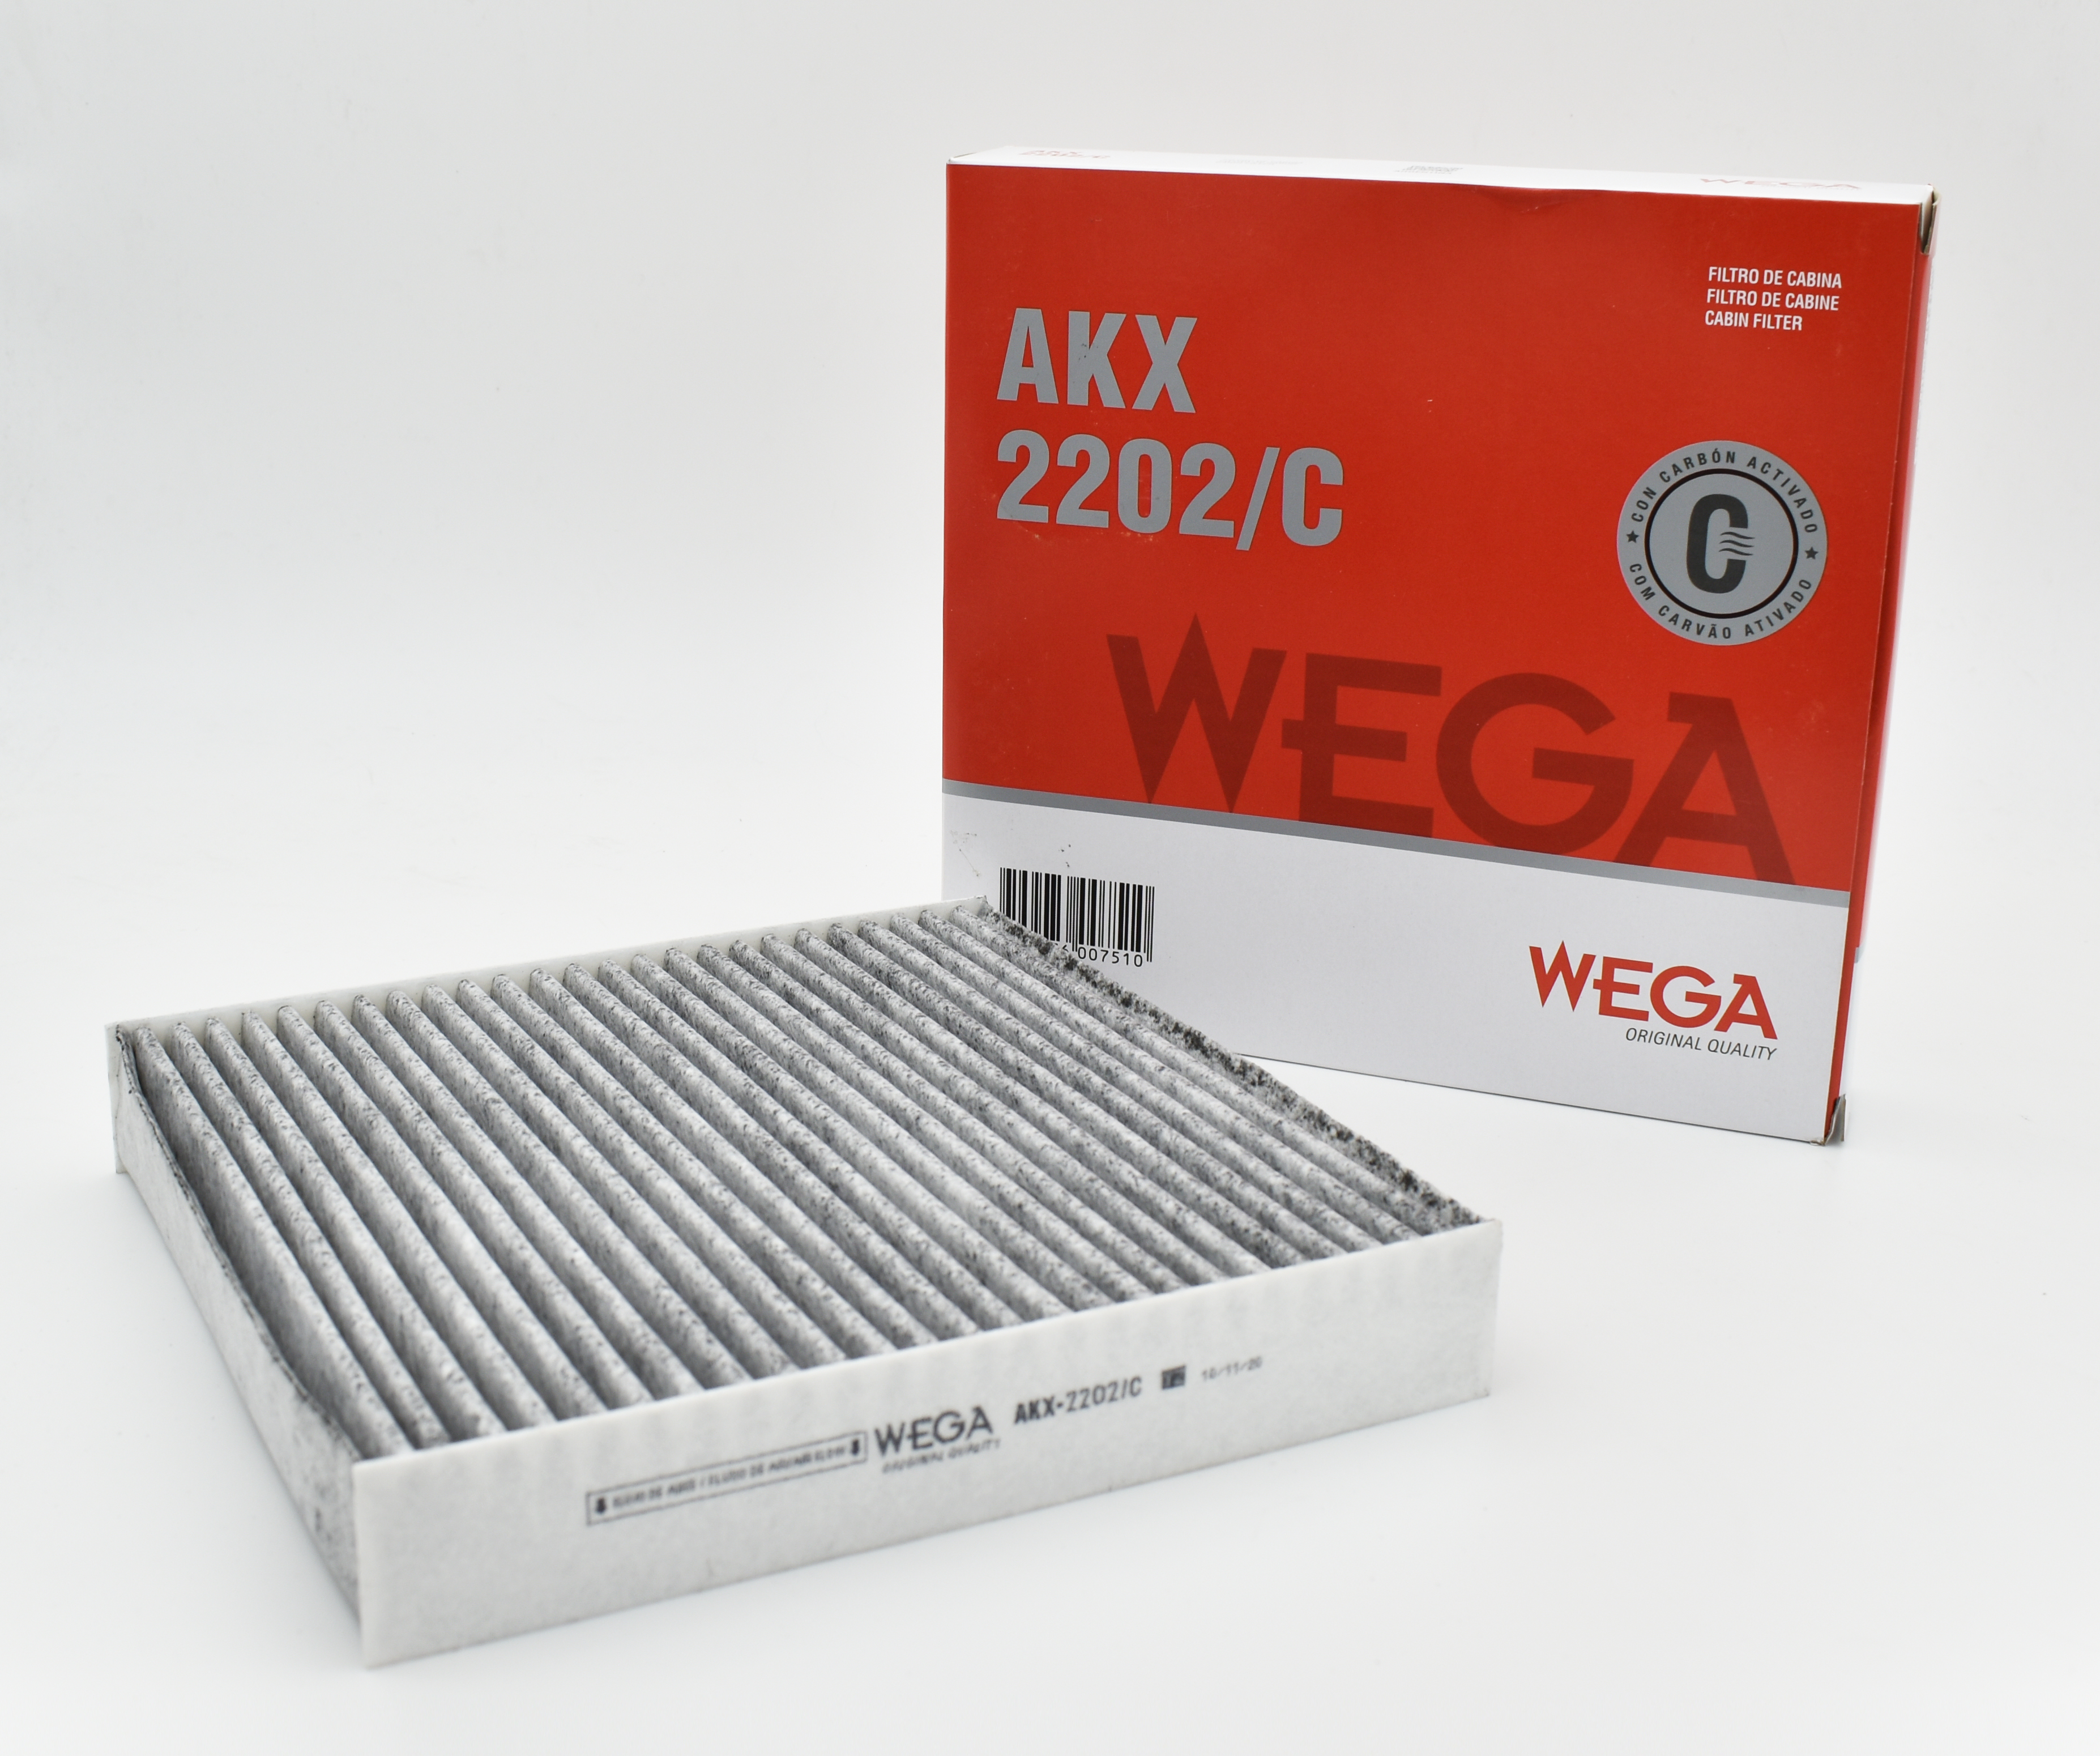 Código: AKX-2202/C